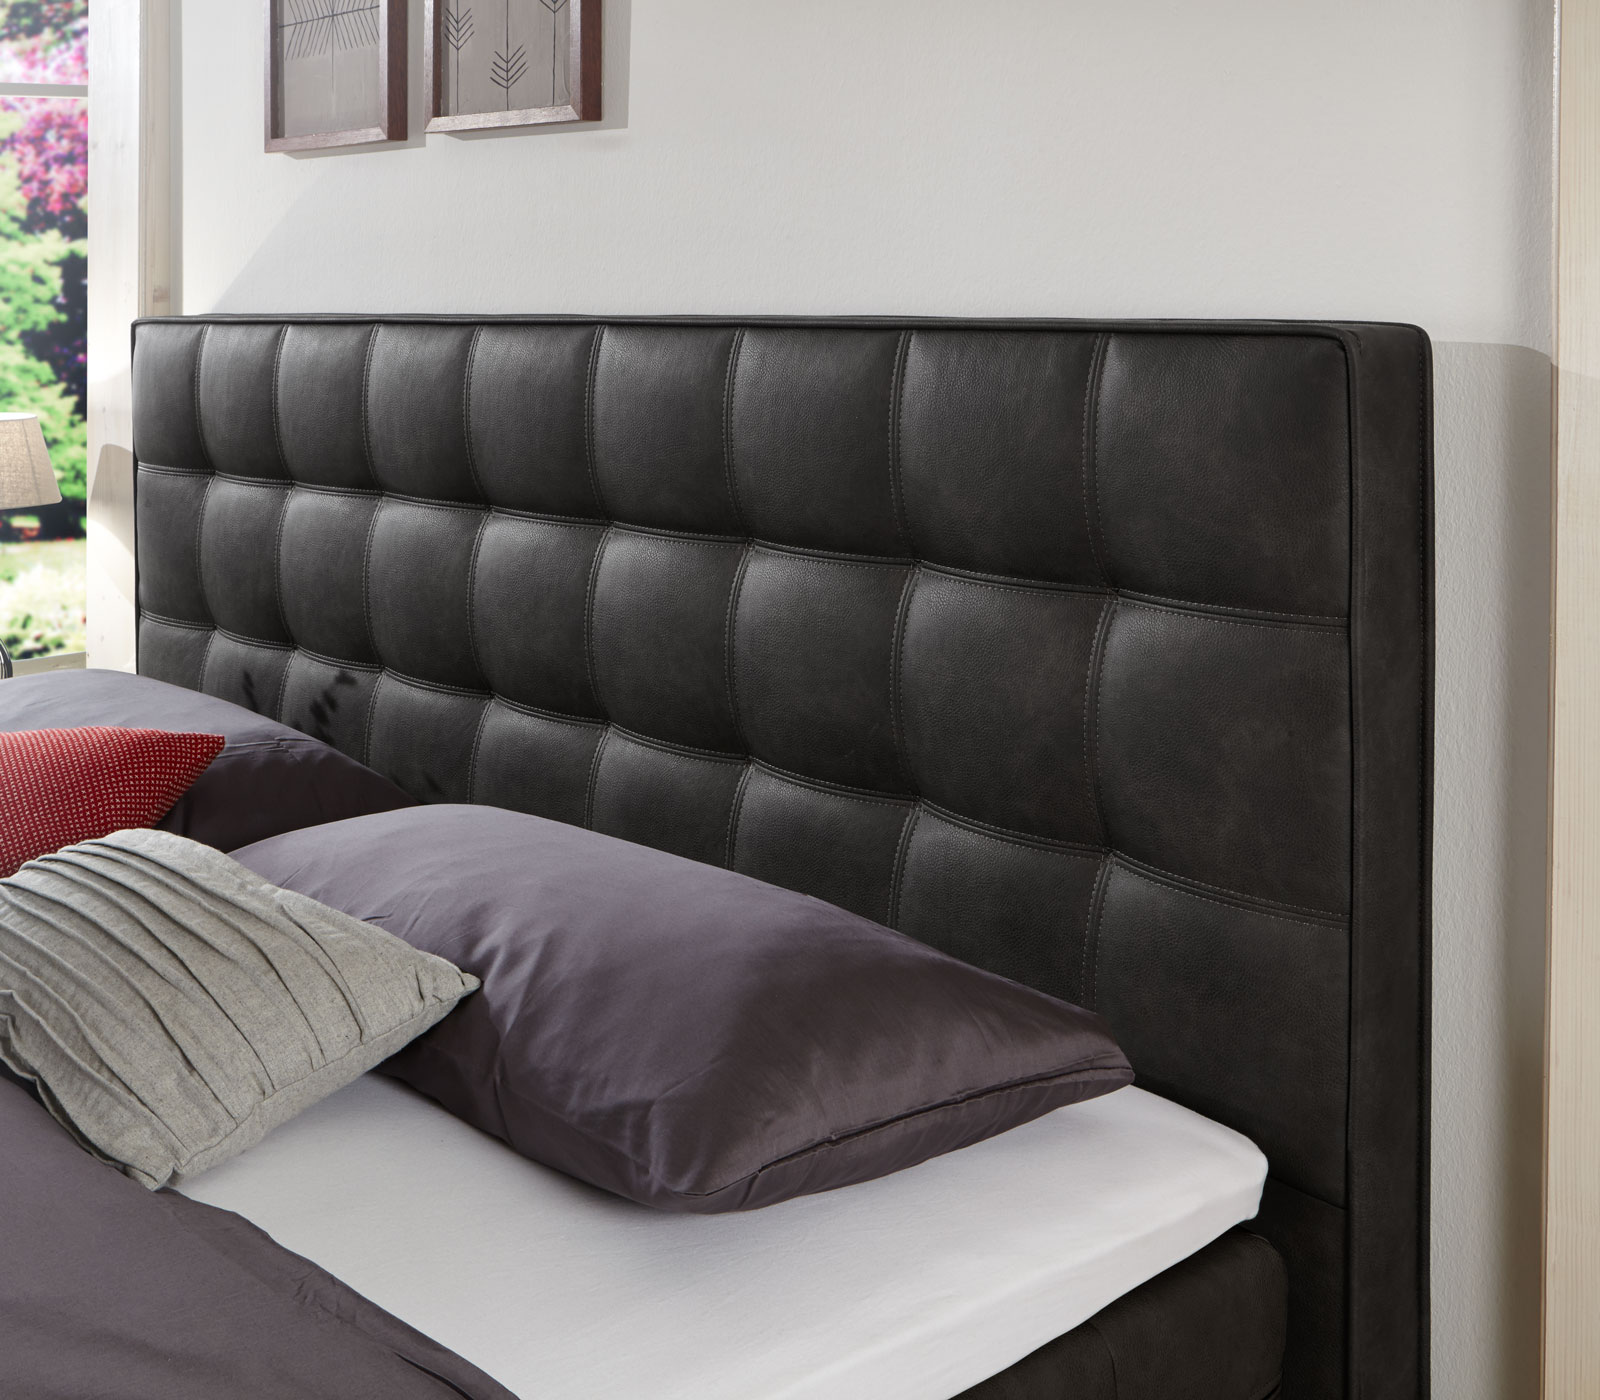 boxspringbett 90x200 mit taschenfederkern matratze zamora. Black Bedroom Furniture Sets. Home Design Ideas